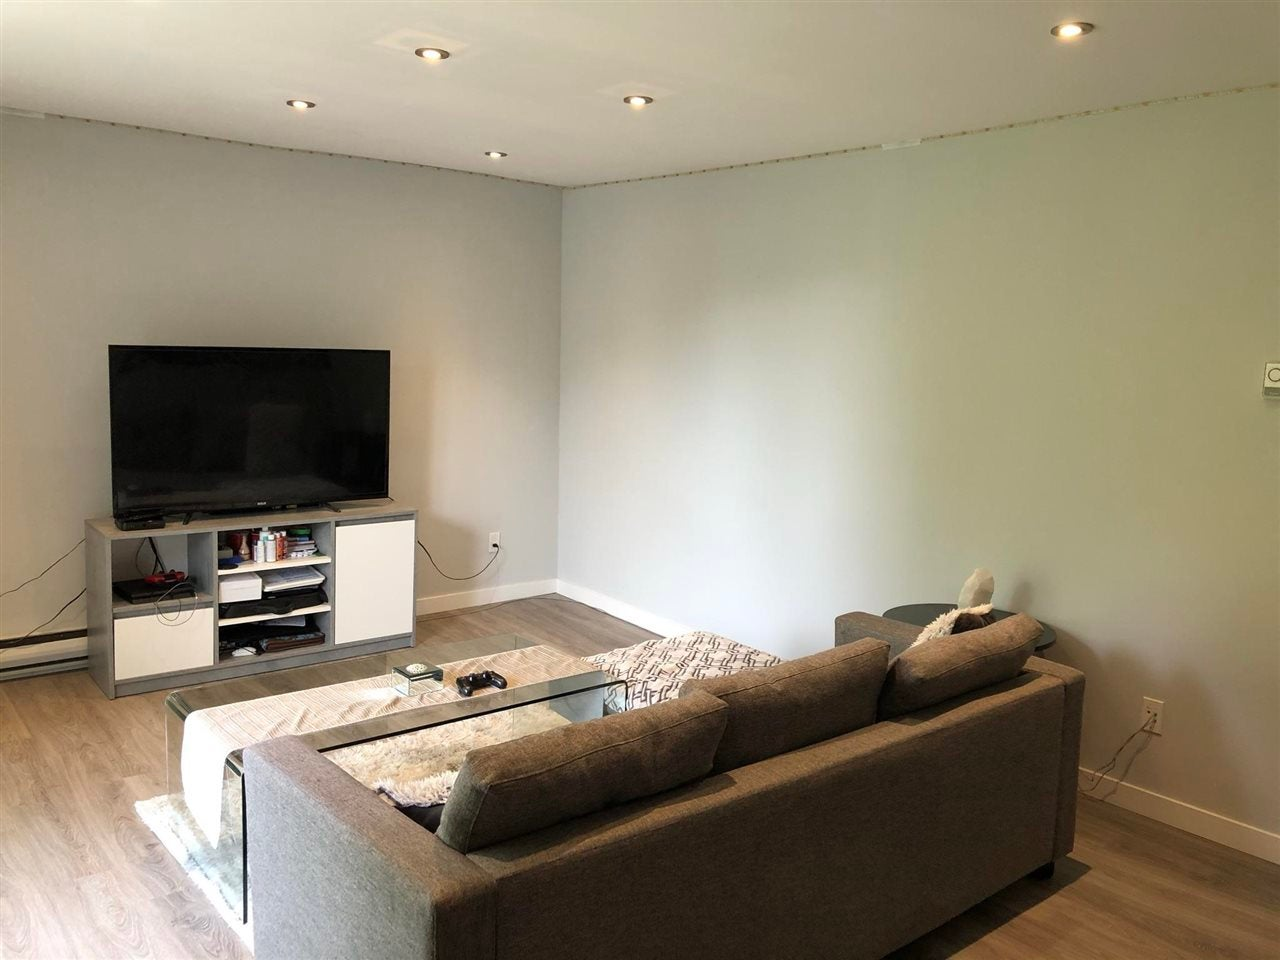 304 15238 100 AVENUE - Guildford Apartment/Condo for sale, 1 Bedroom (R2576105) - #4